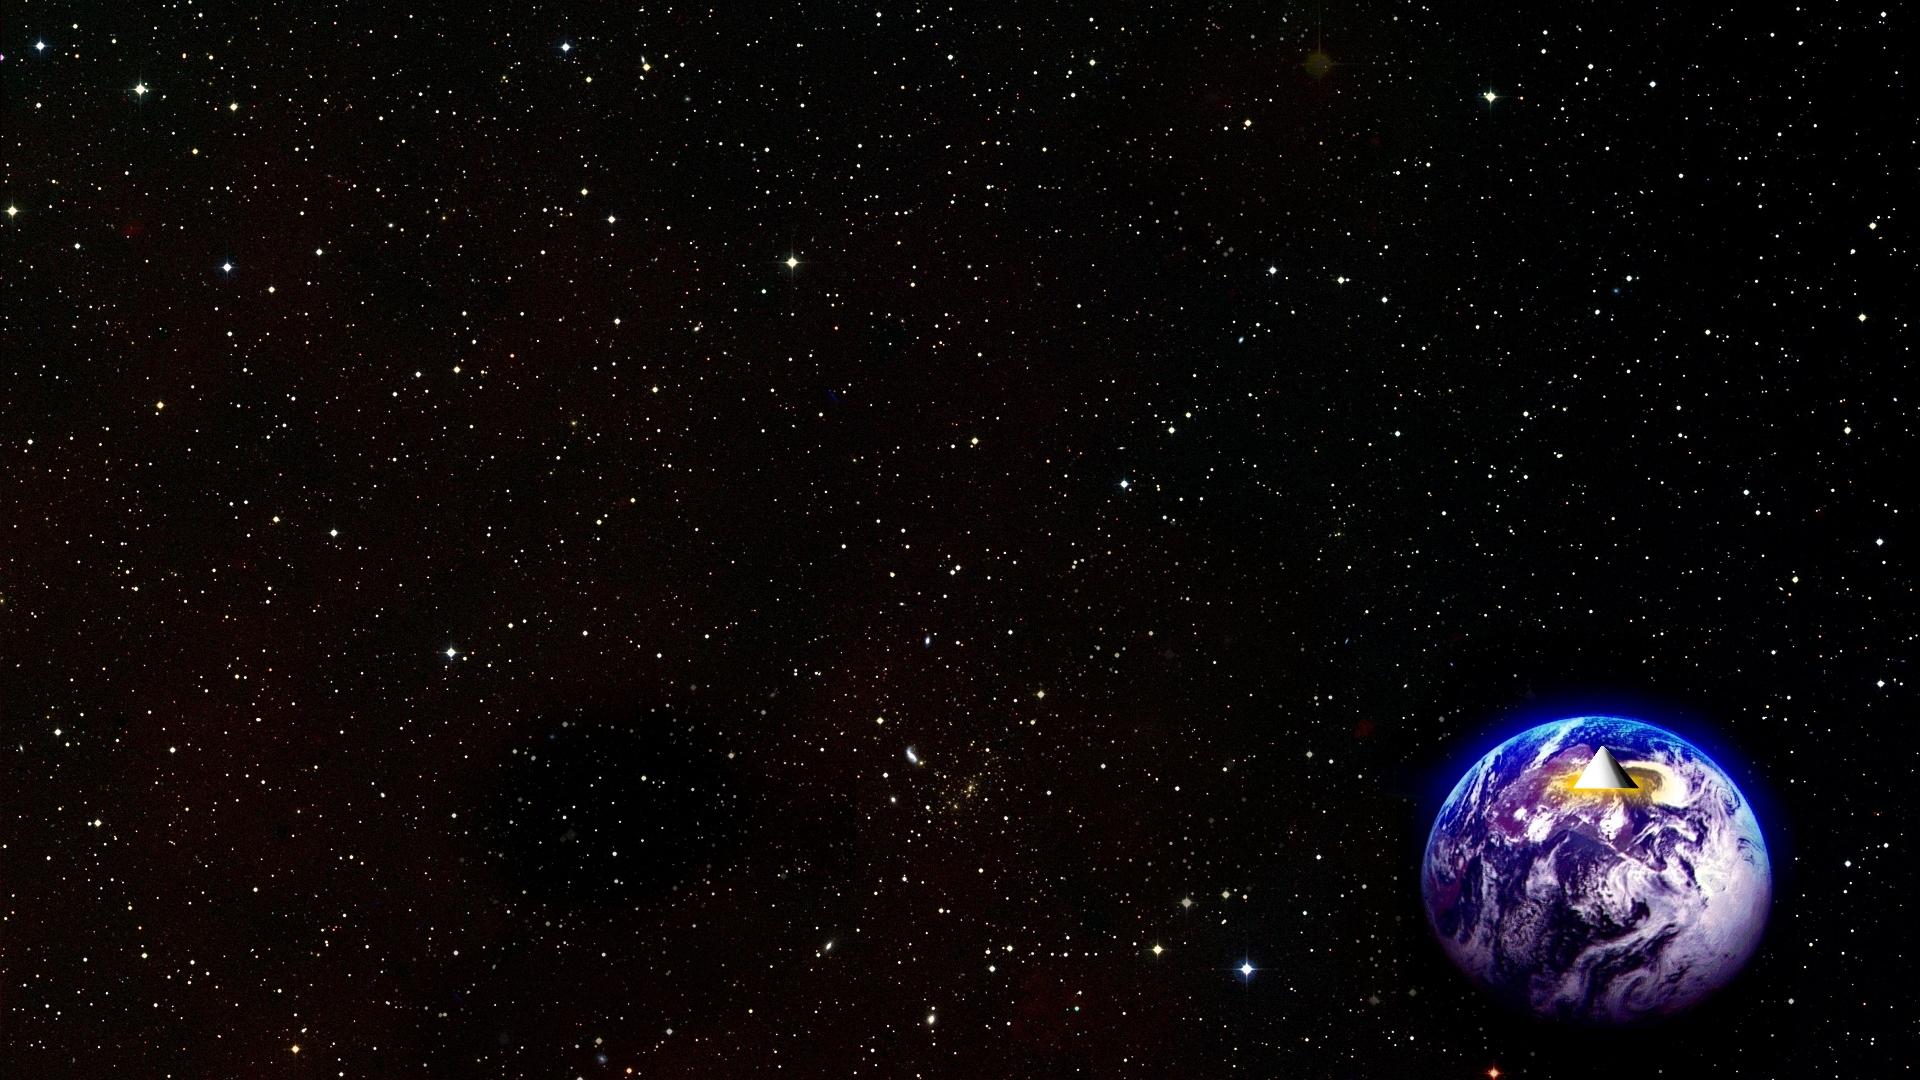 backgrounds desktop field star - photo #18